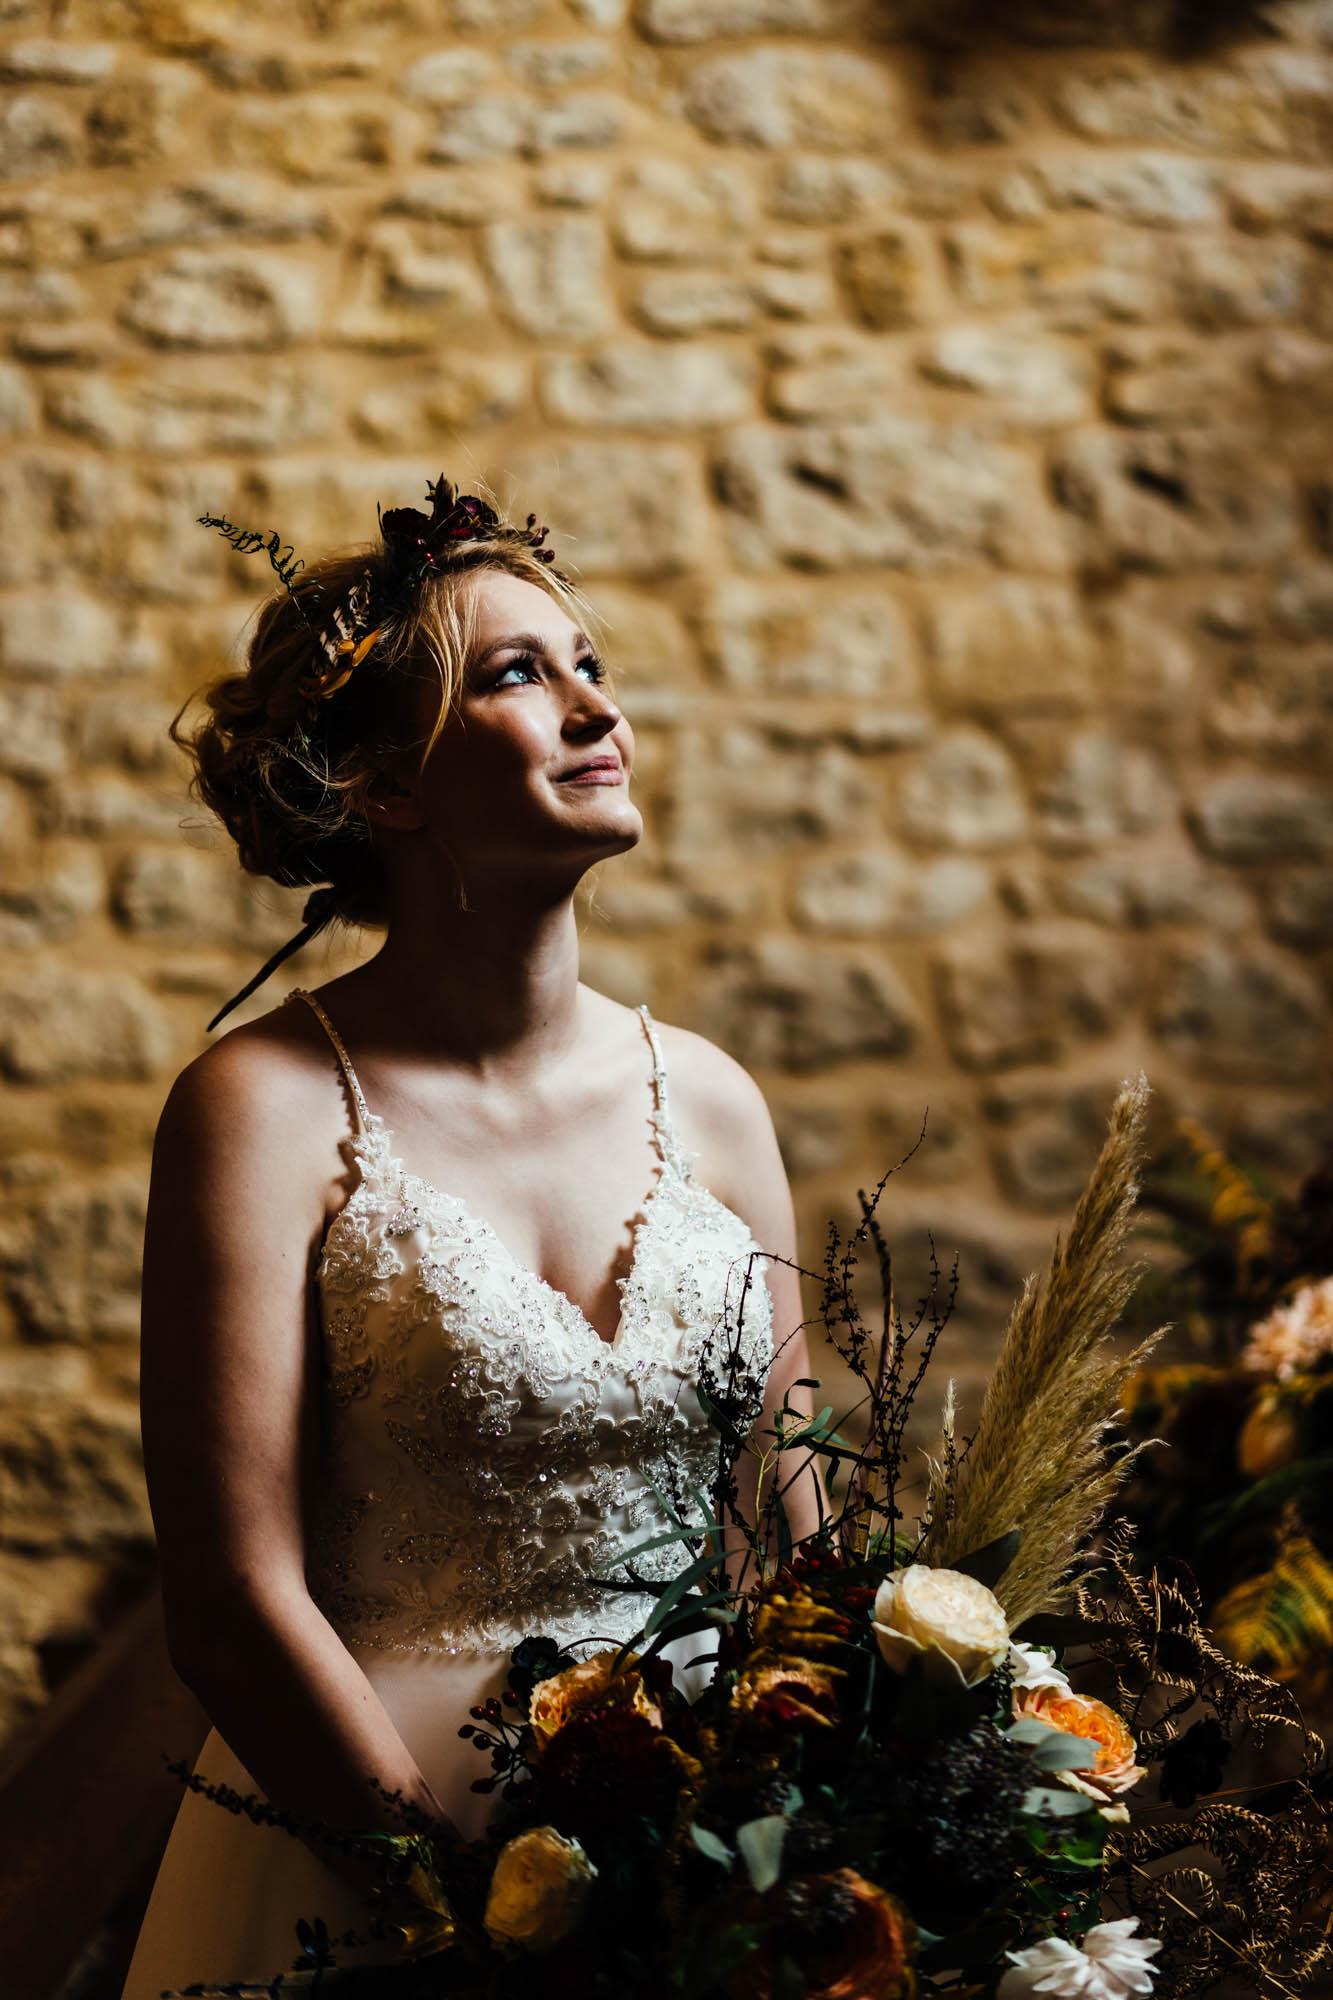 huntsmill-farm-wedding-inspiration-23